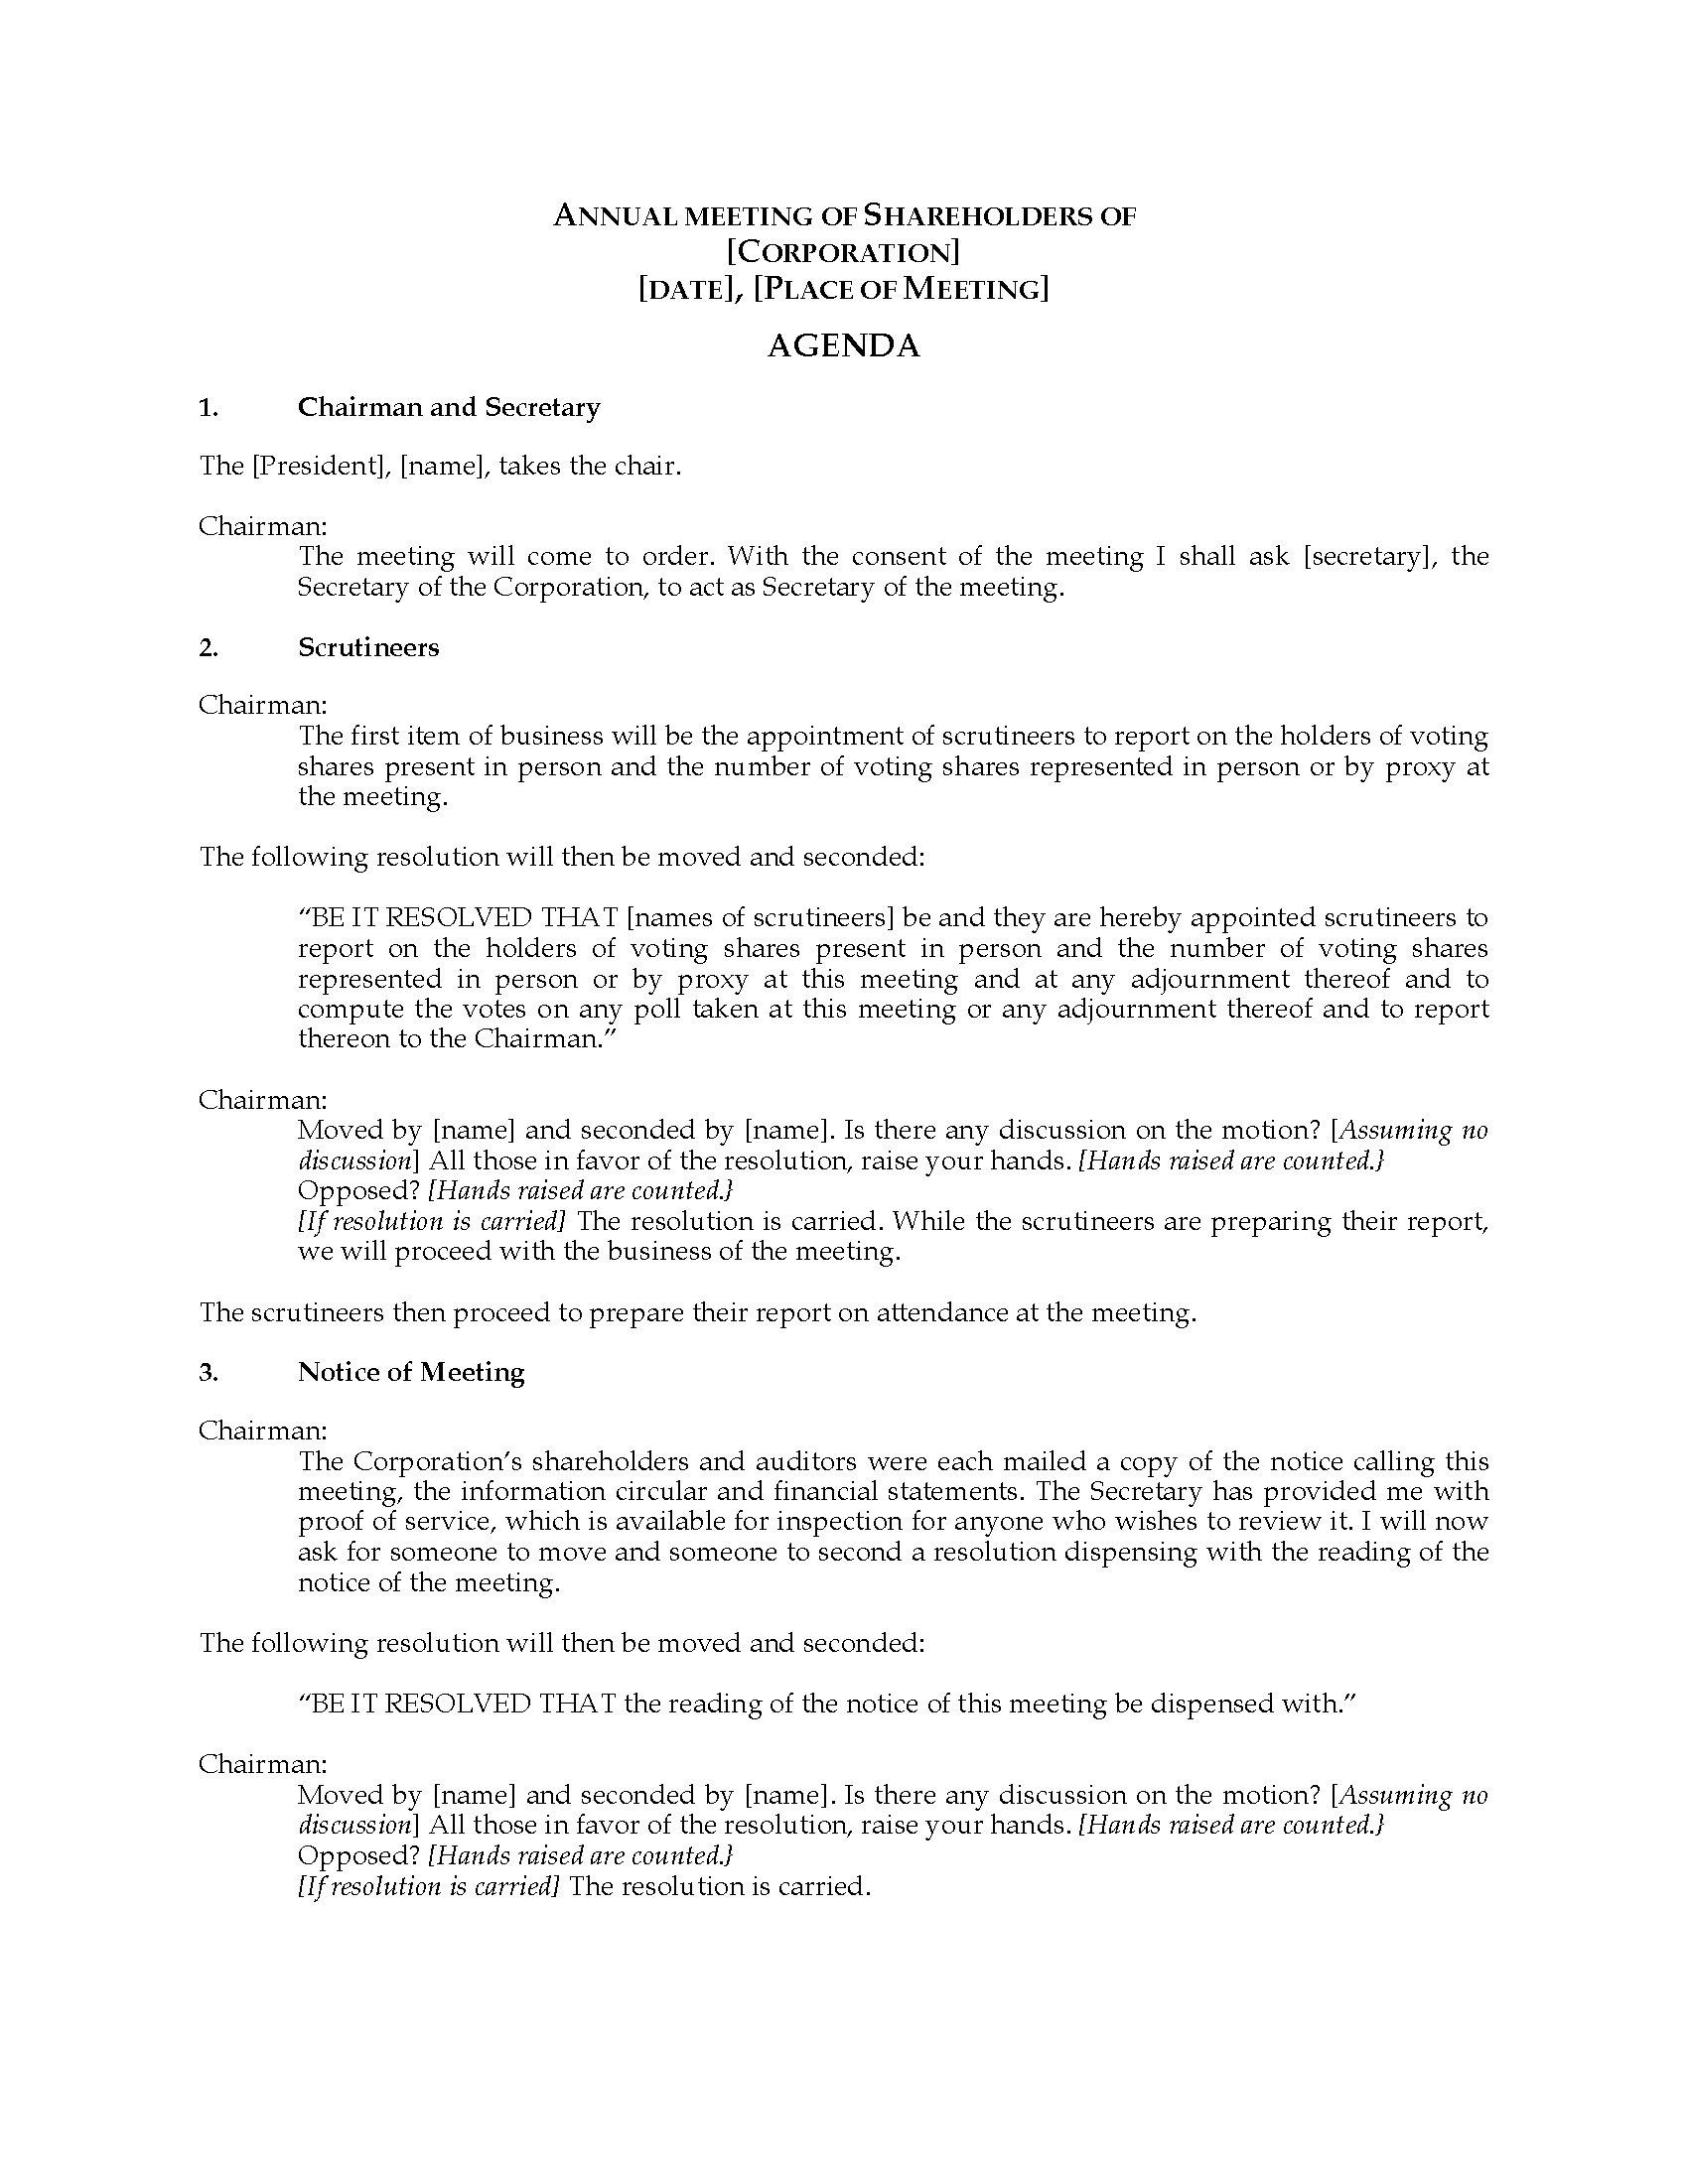 canada agenda for annual shareholders meeting